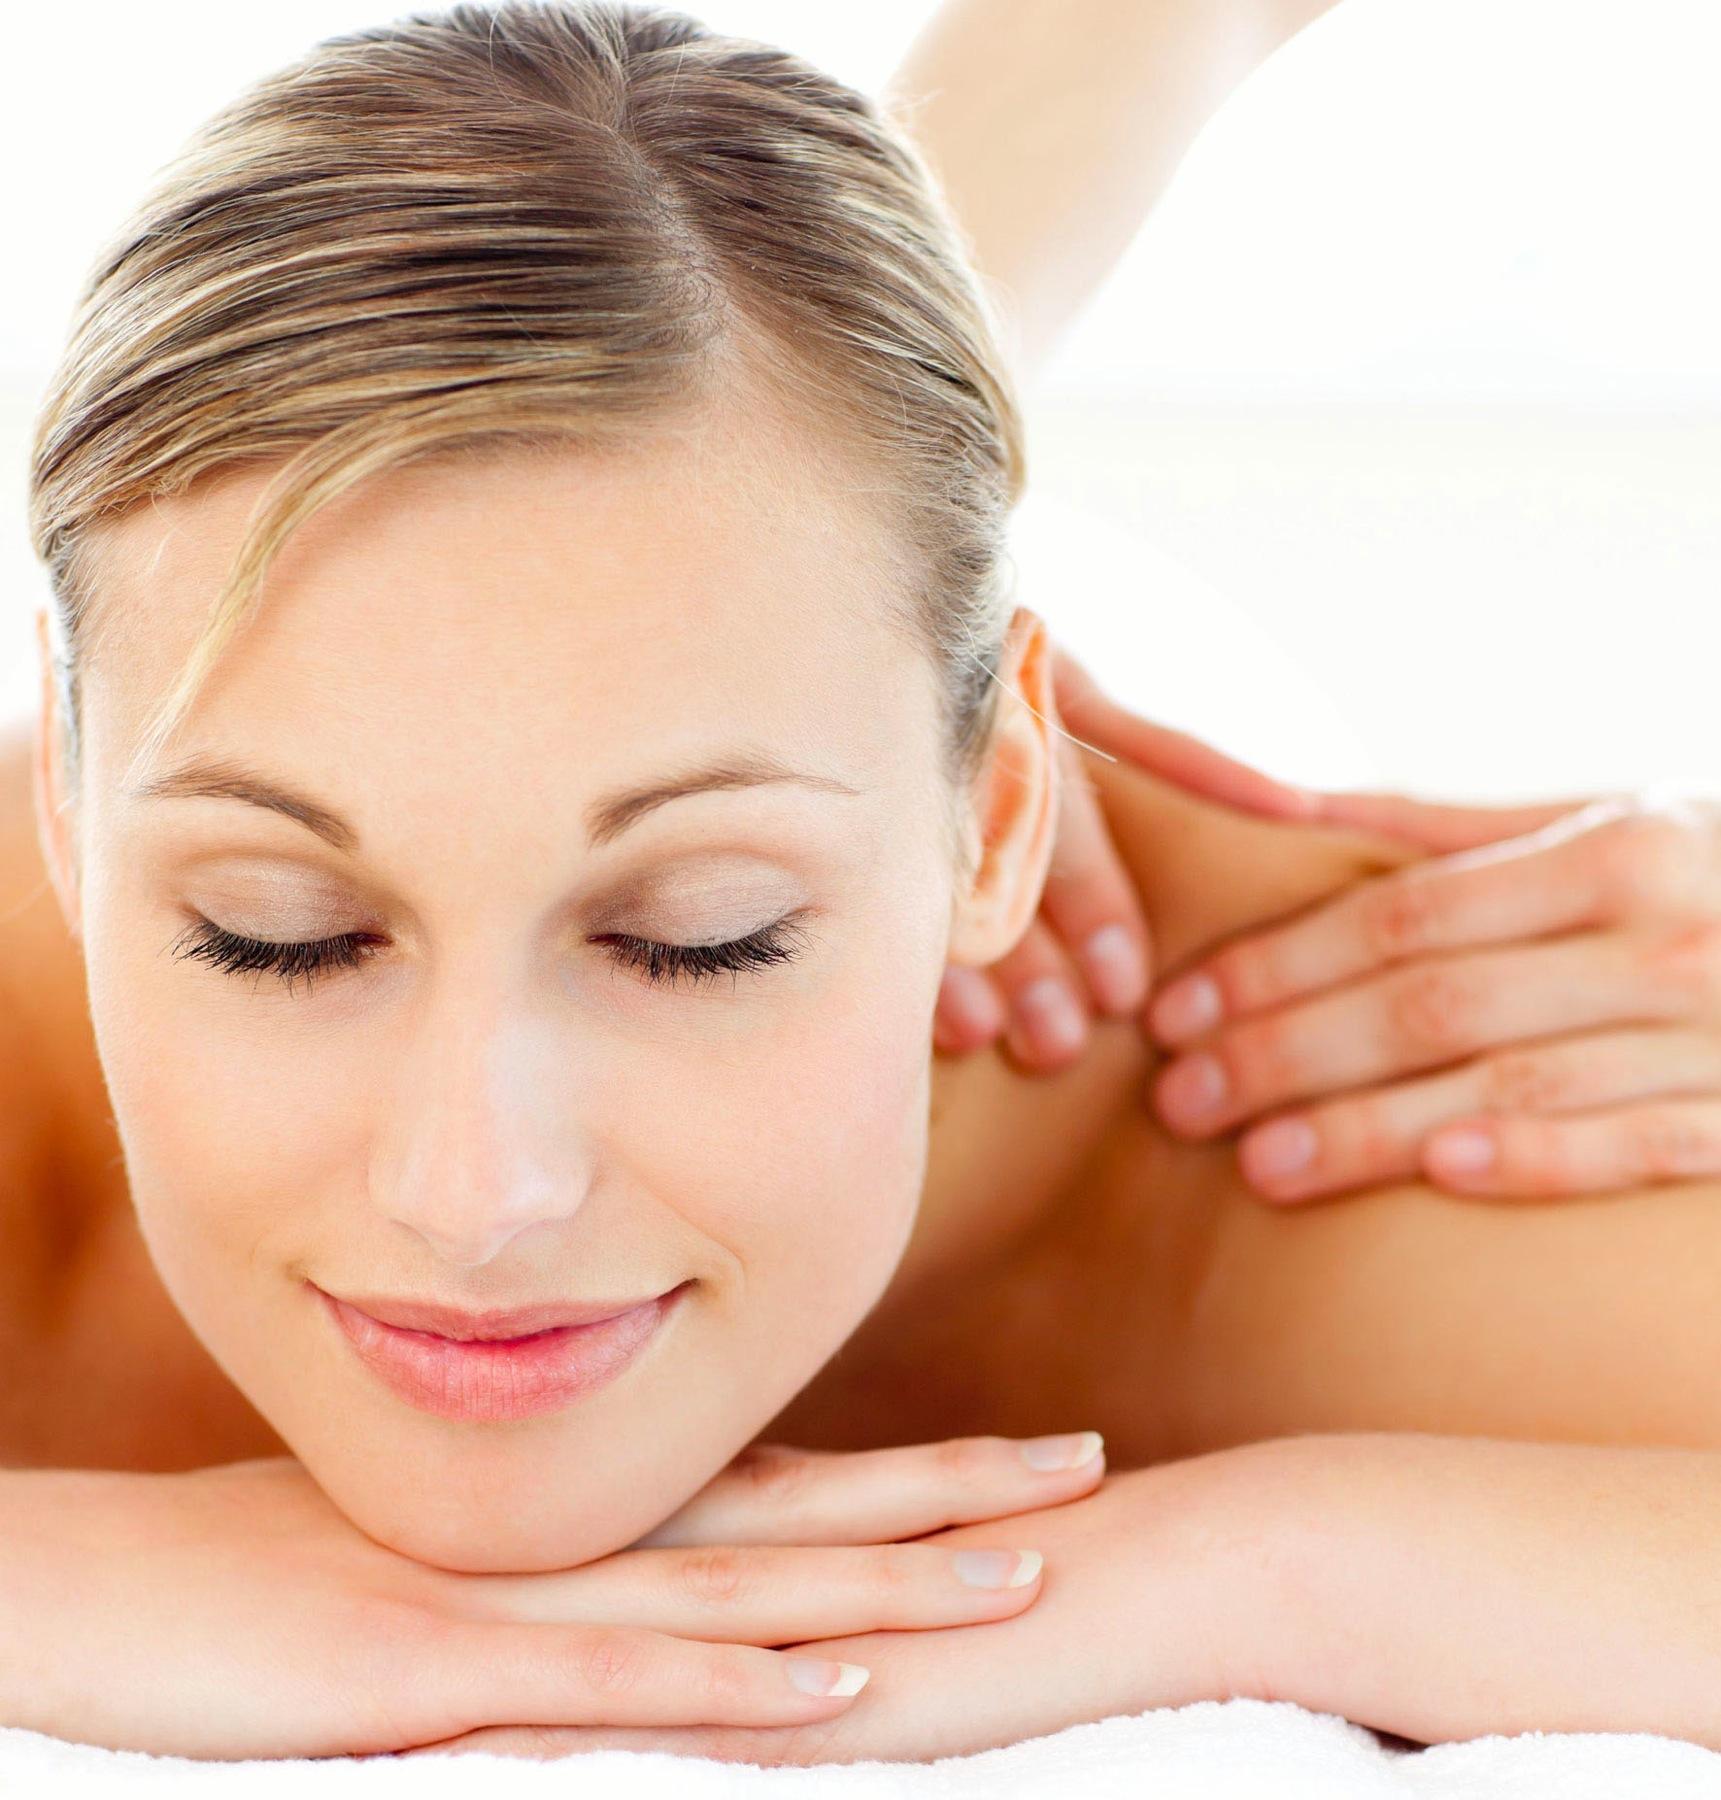 fotmassage göteborg naked breast